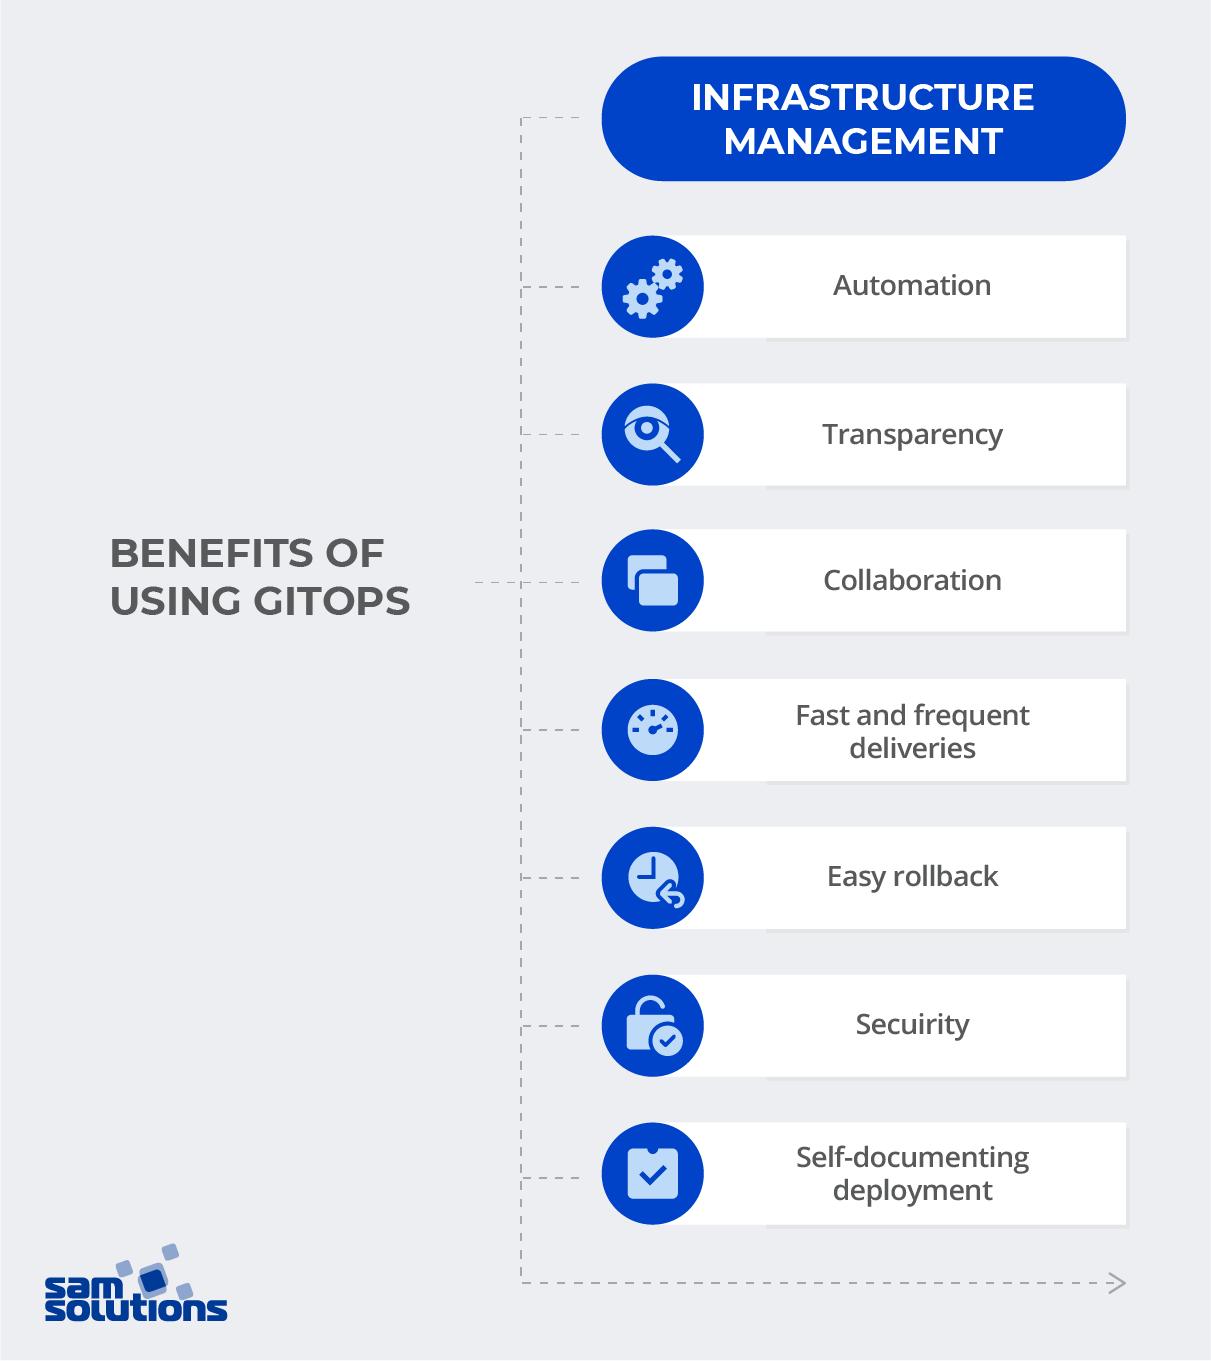 Benefits of using GitOps